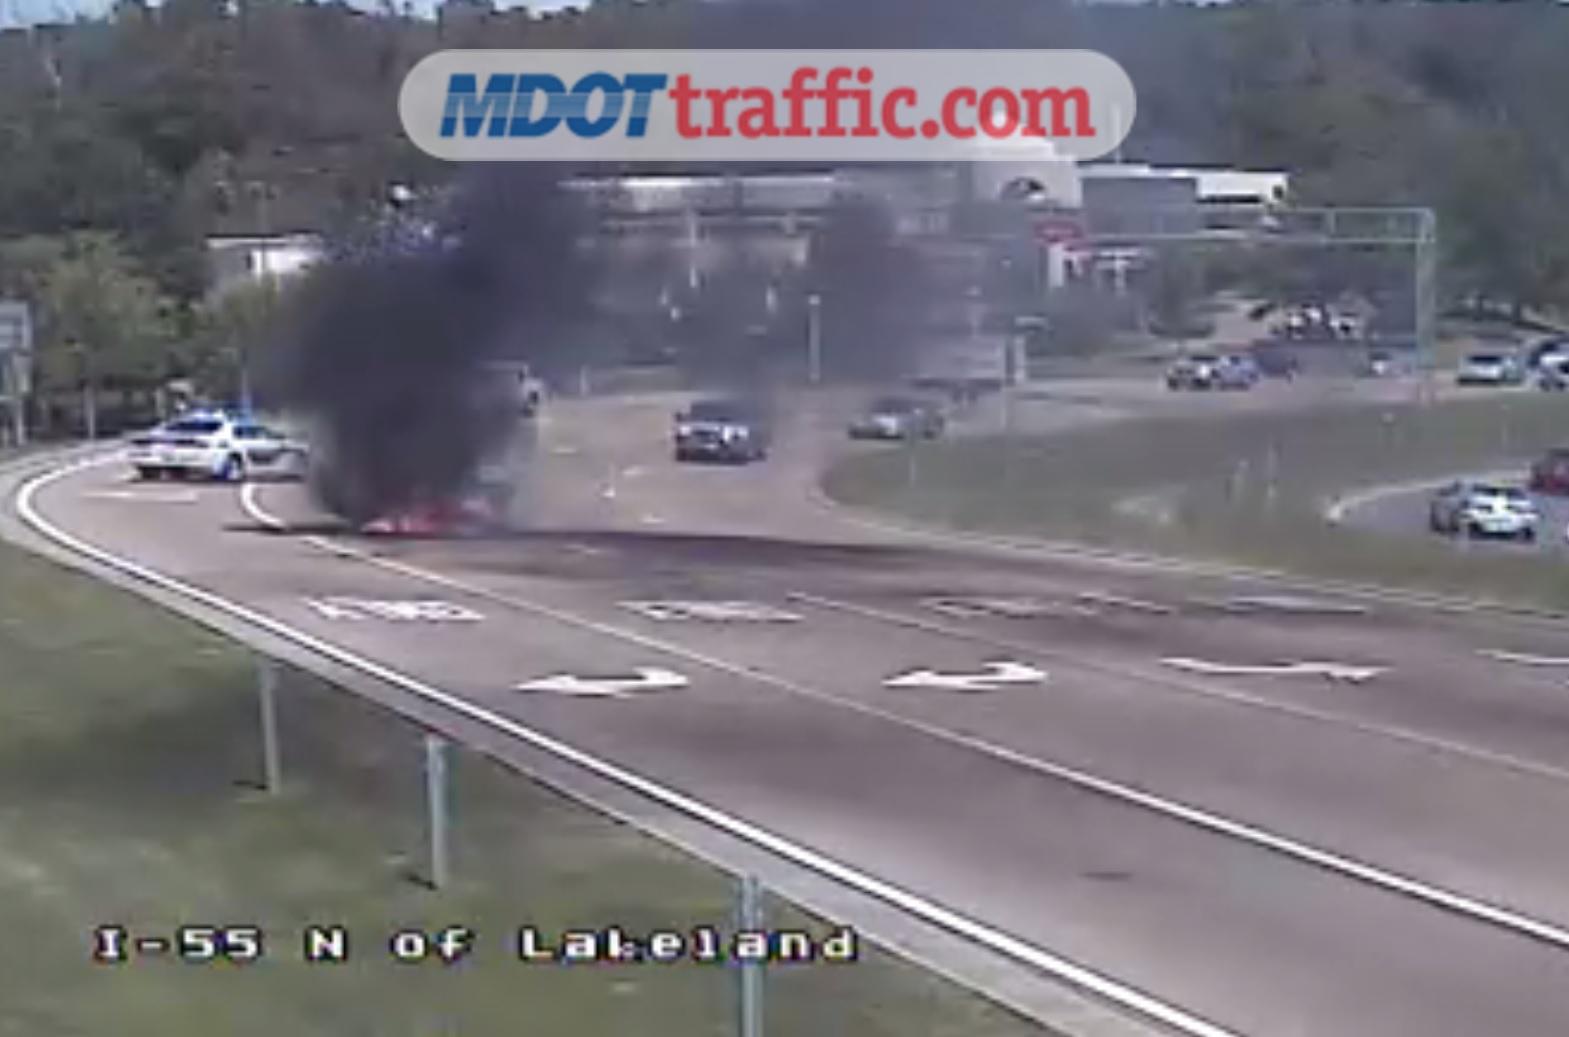 vehicle fire on 55 at lakeland_422936